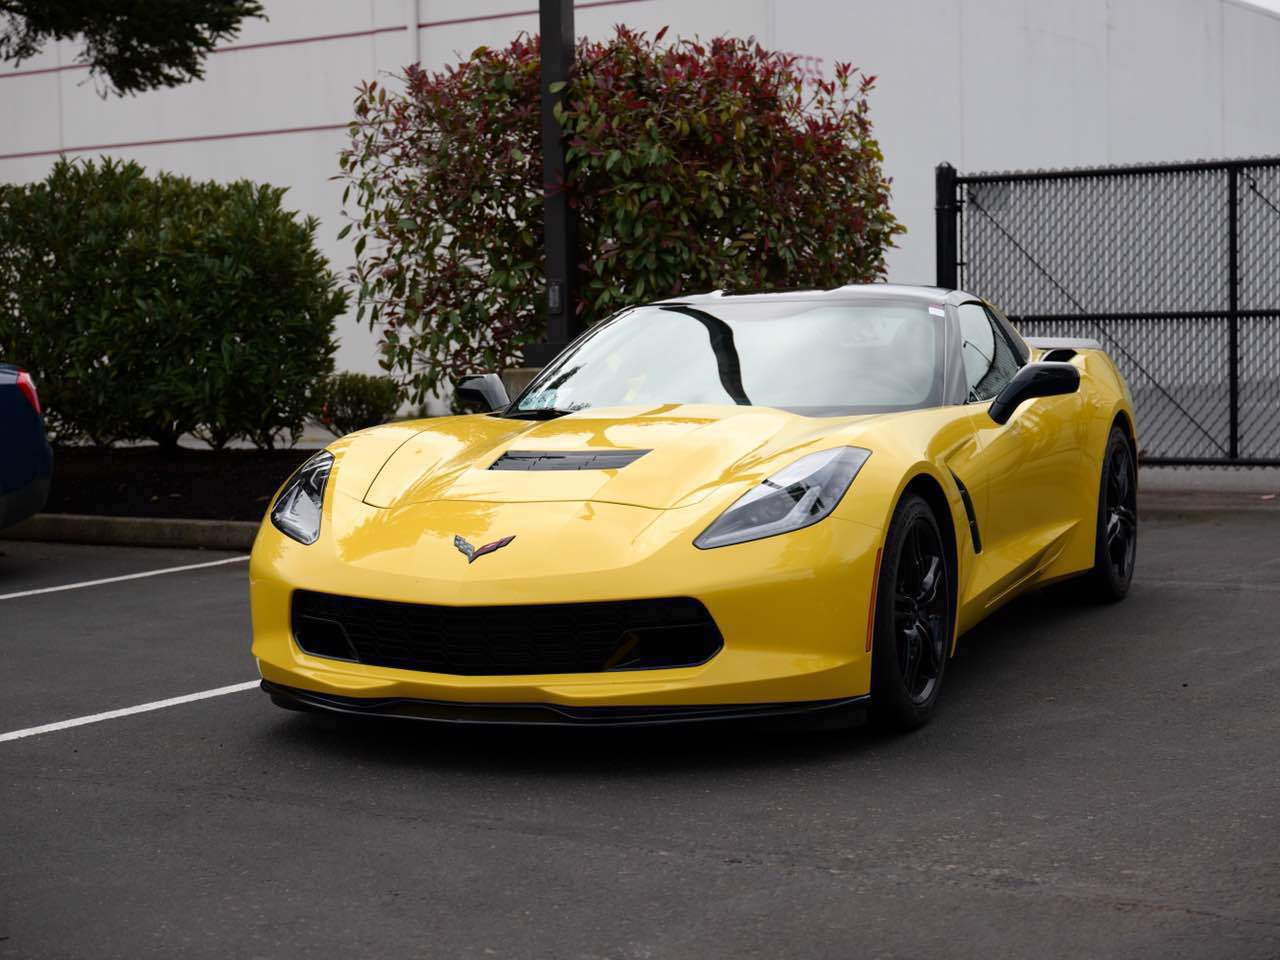 for sale 2016 corvette stingray c7 yellow black 7 500 miles oregon corvetteforum chevrolet. Black Bedroom Furniture Sets. Home Design Ideas